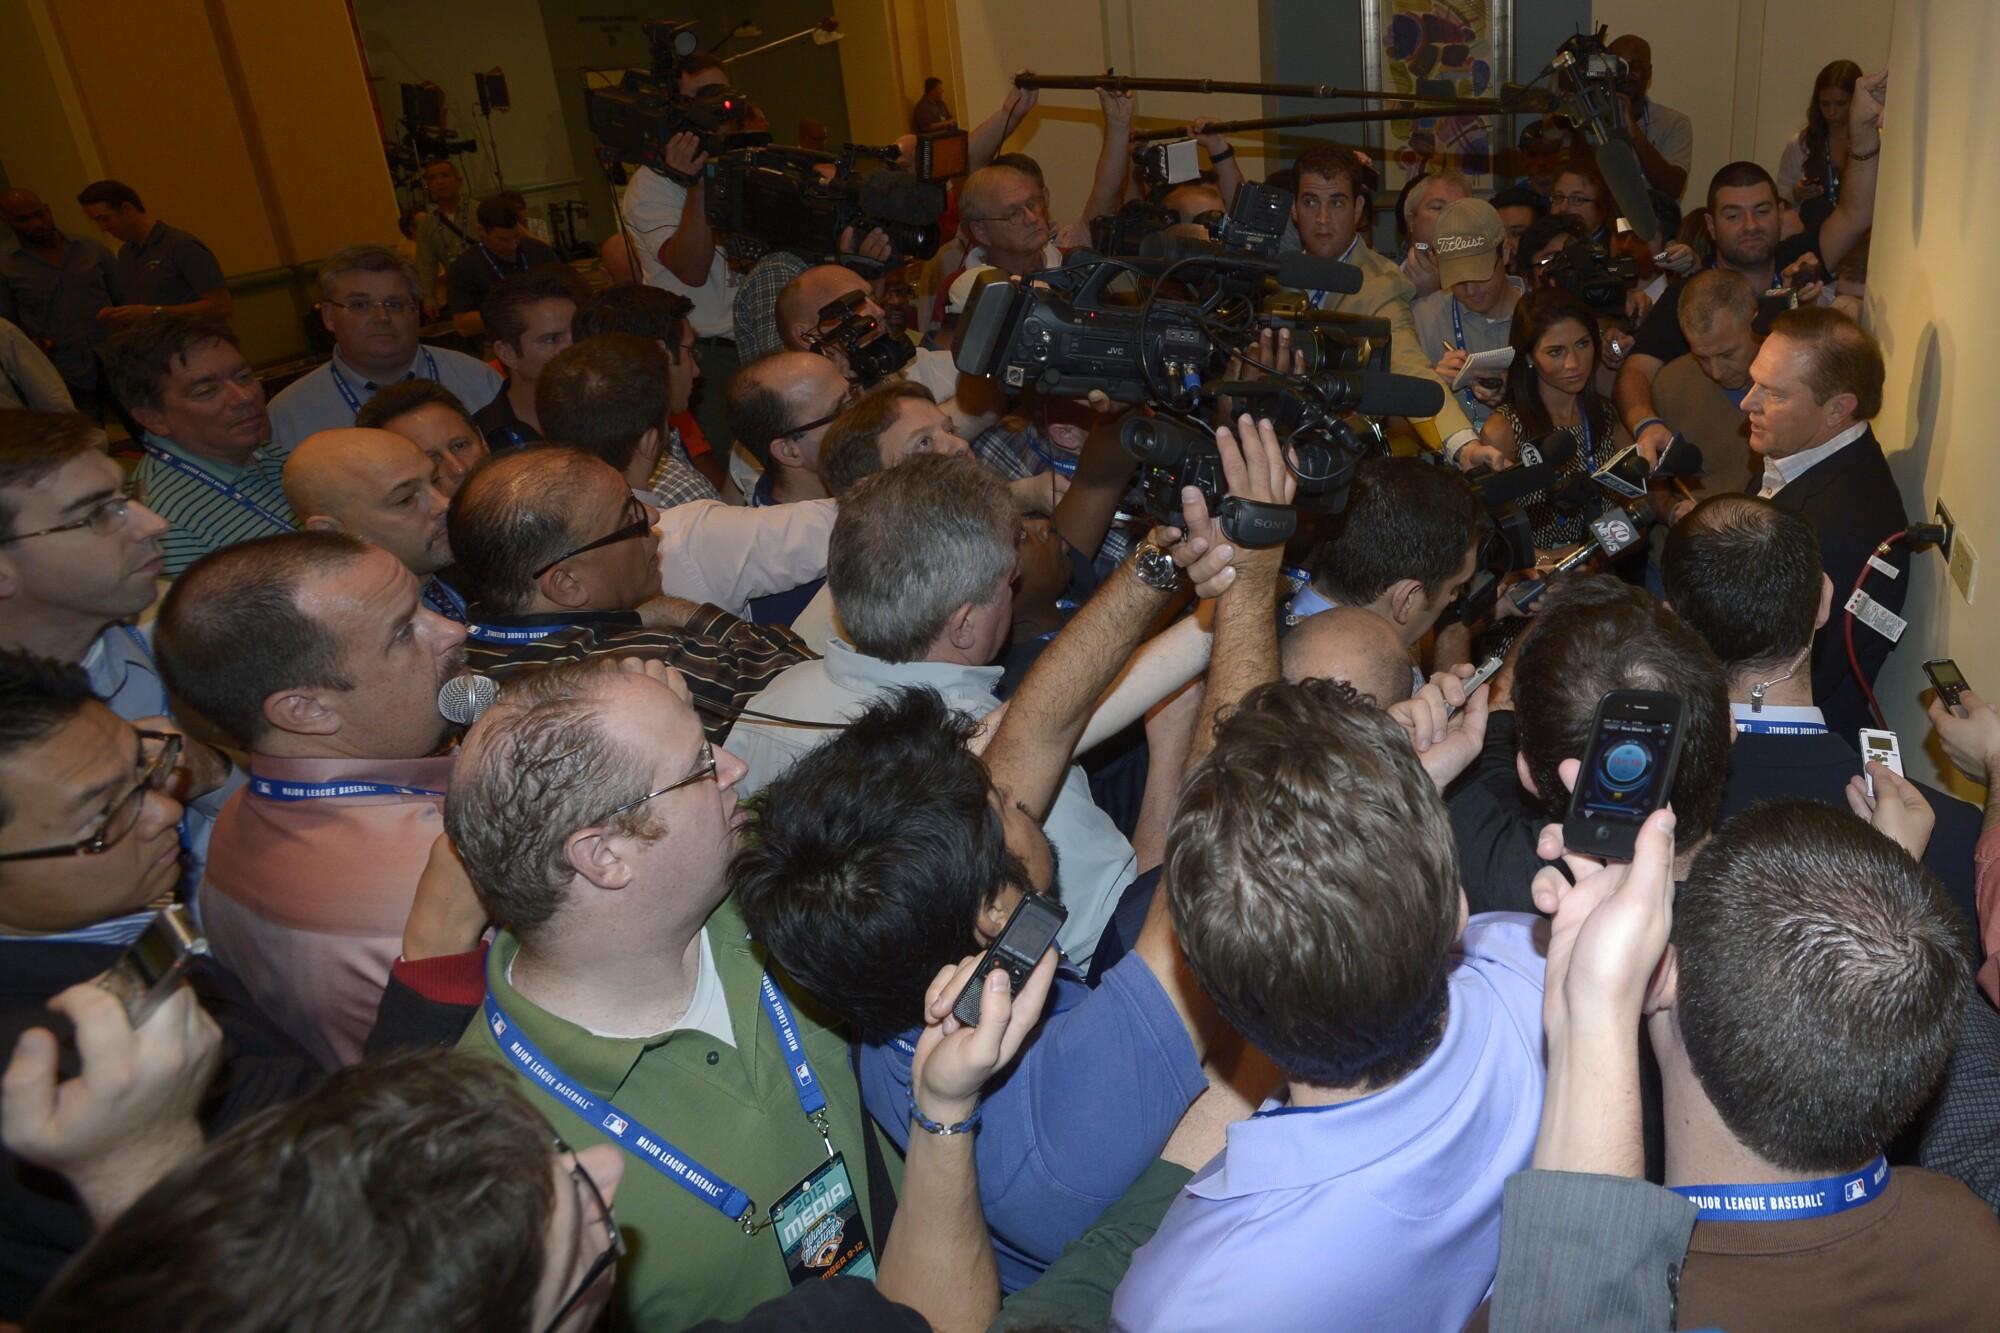 Agent Scott Boras, right, speaks to the media at baseball's winter meetings Dec. 11, 2013, in Lake Buena Vista, Fla.